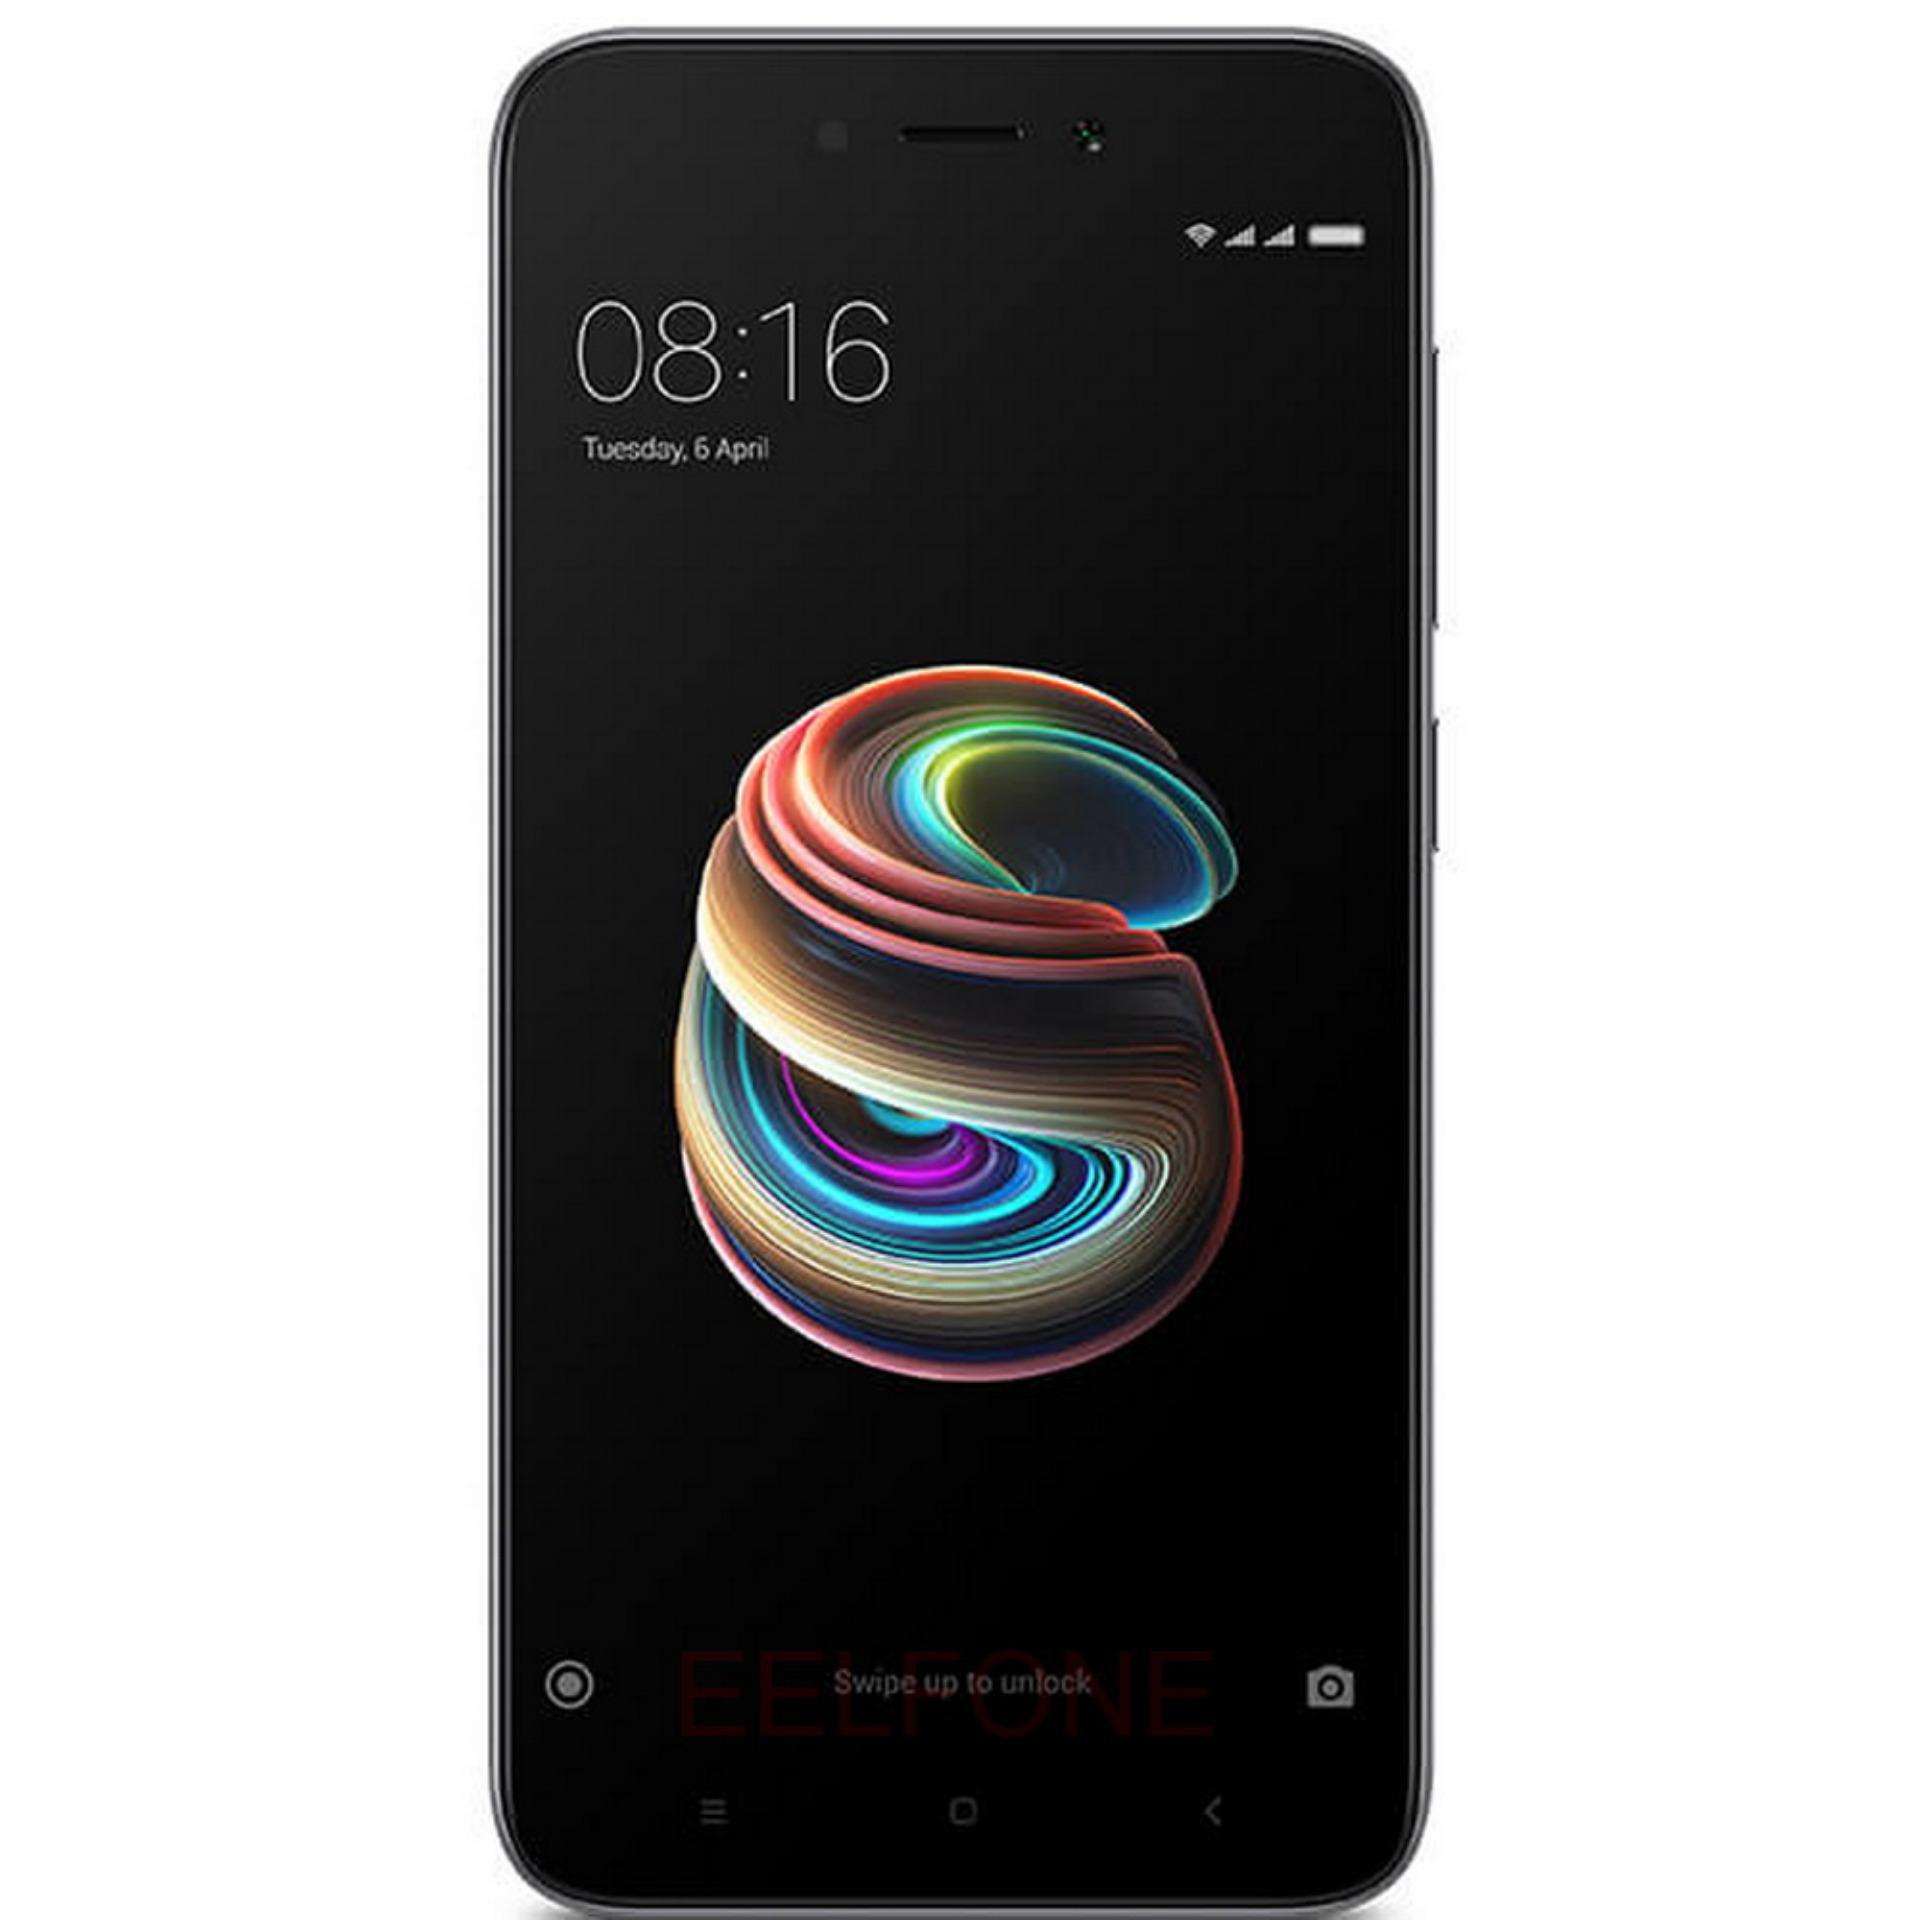 Kehebatan Advan I5c Lite Mobile Legend 8gb 4g Lte Free 1 5 Gb Kuota Xiaomi Redmi 5a Hd 720p 16gb Internet 15gb